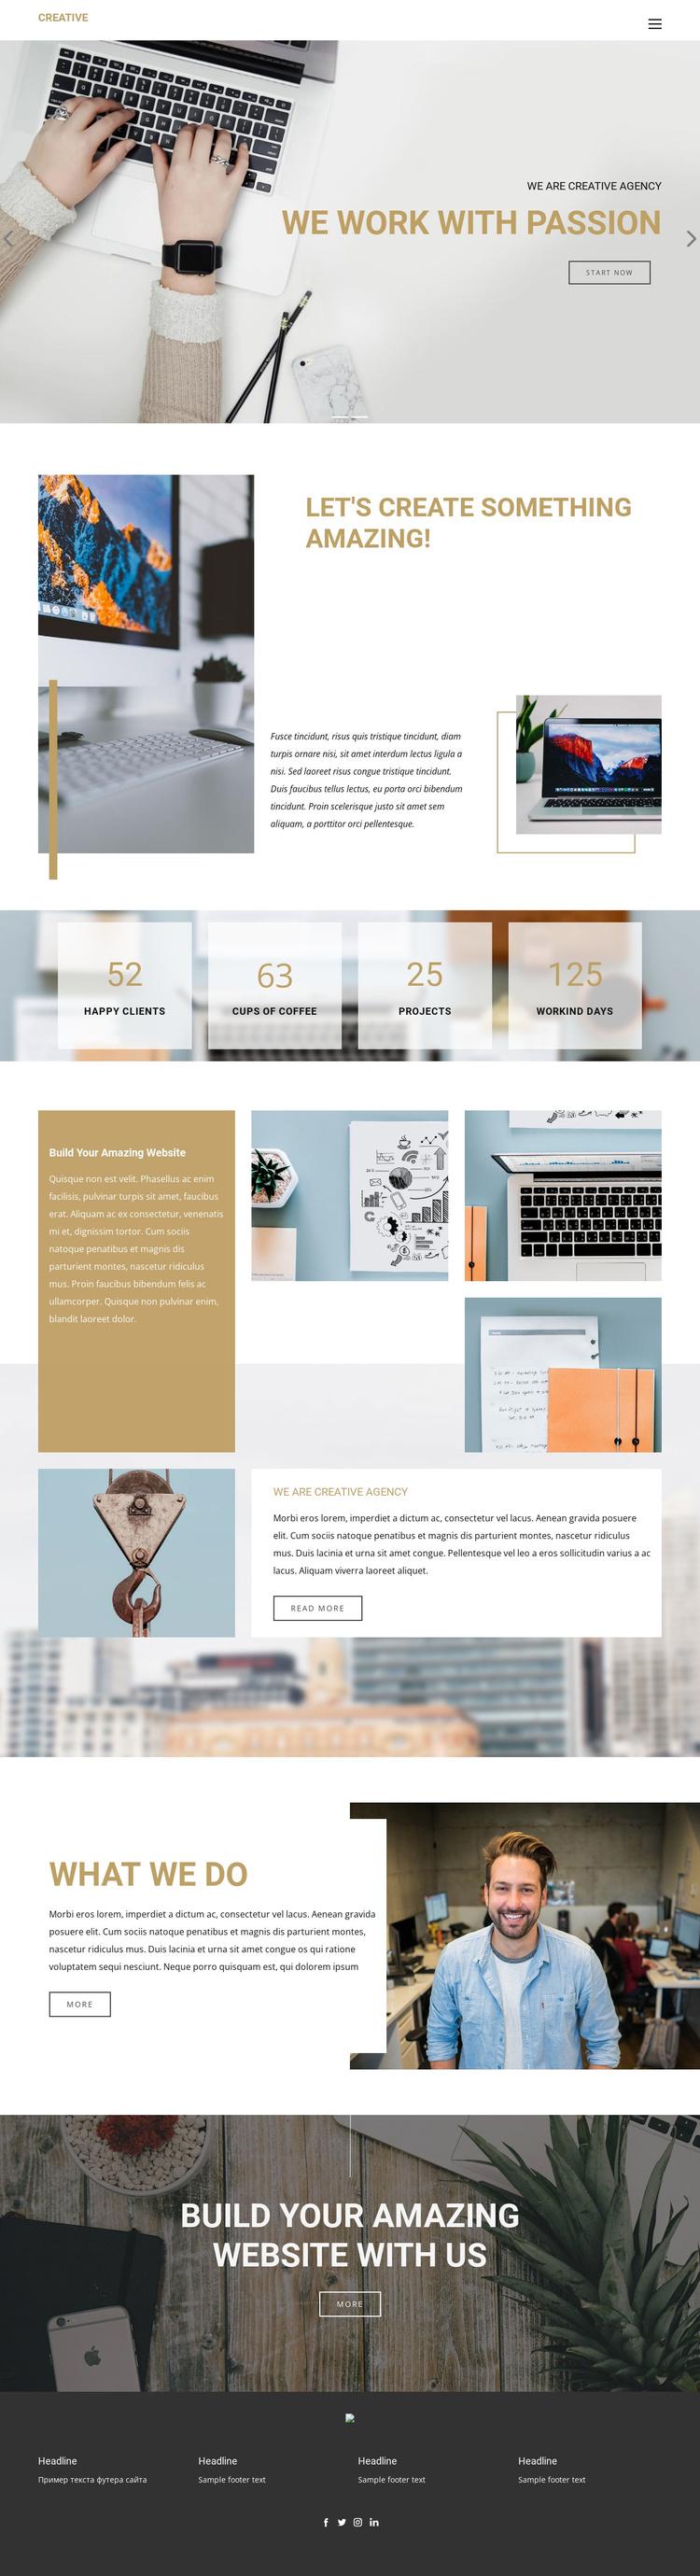 Exceptional creative designs Joomla Template